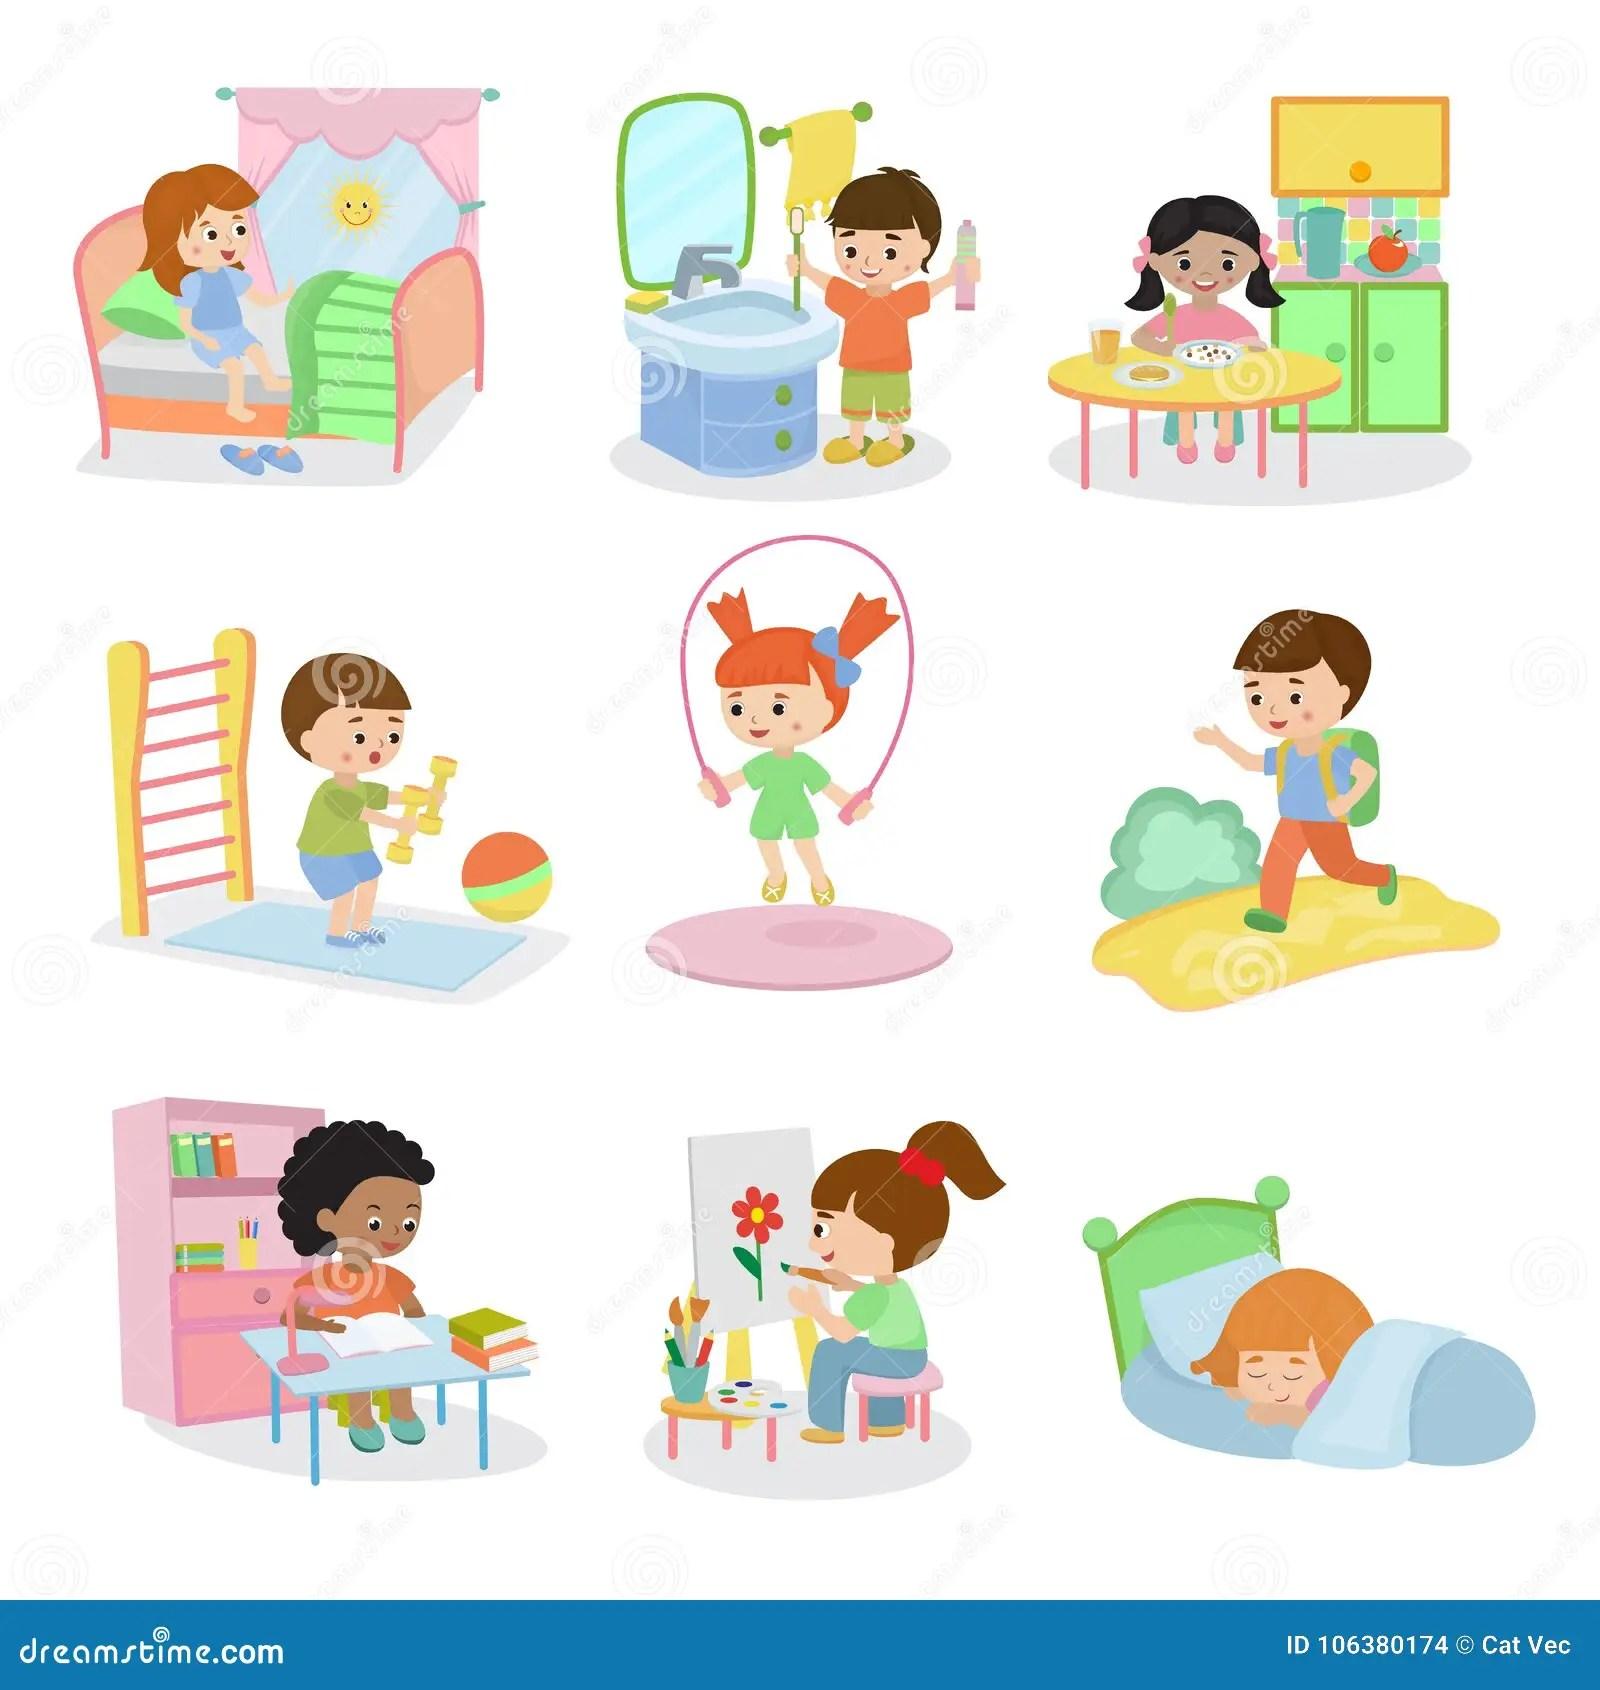 Kids Everyday Activities Vector Set Children Daily Activity Routine In Childhood Character